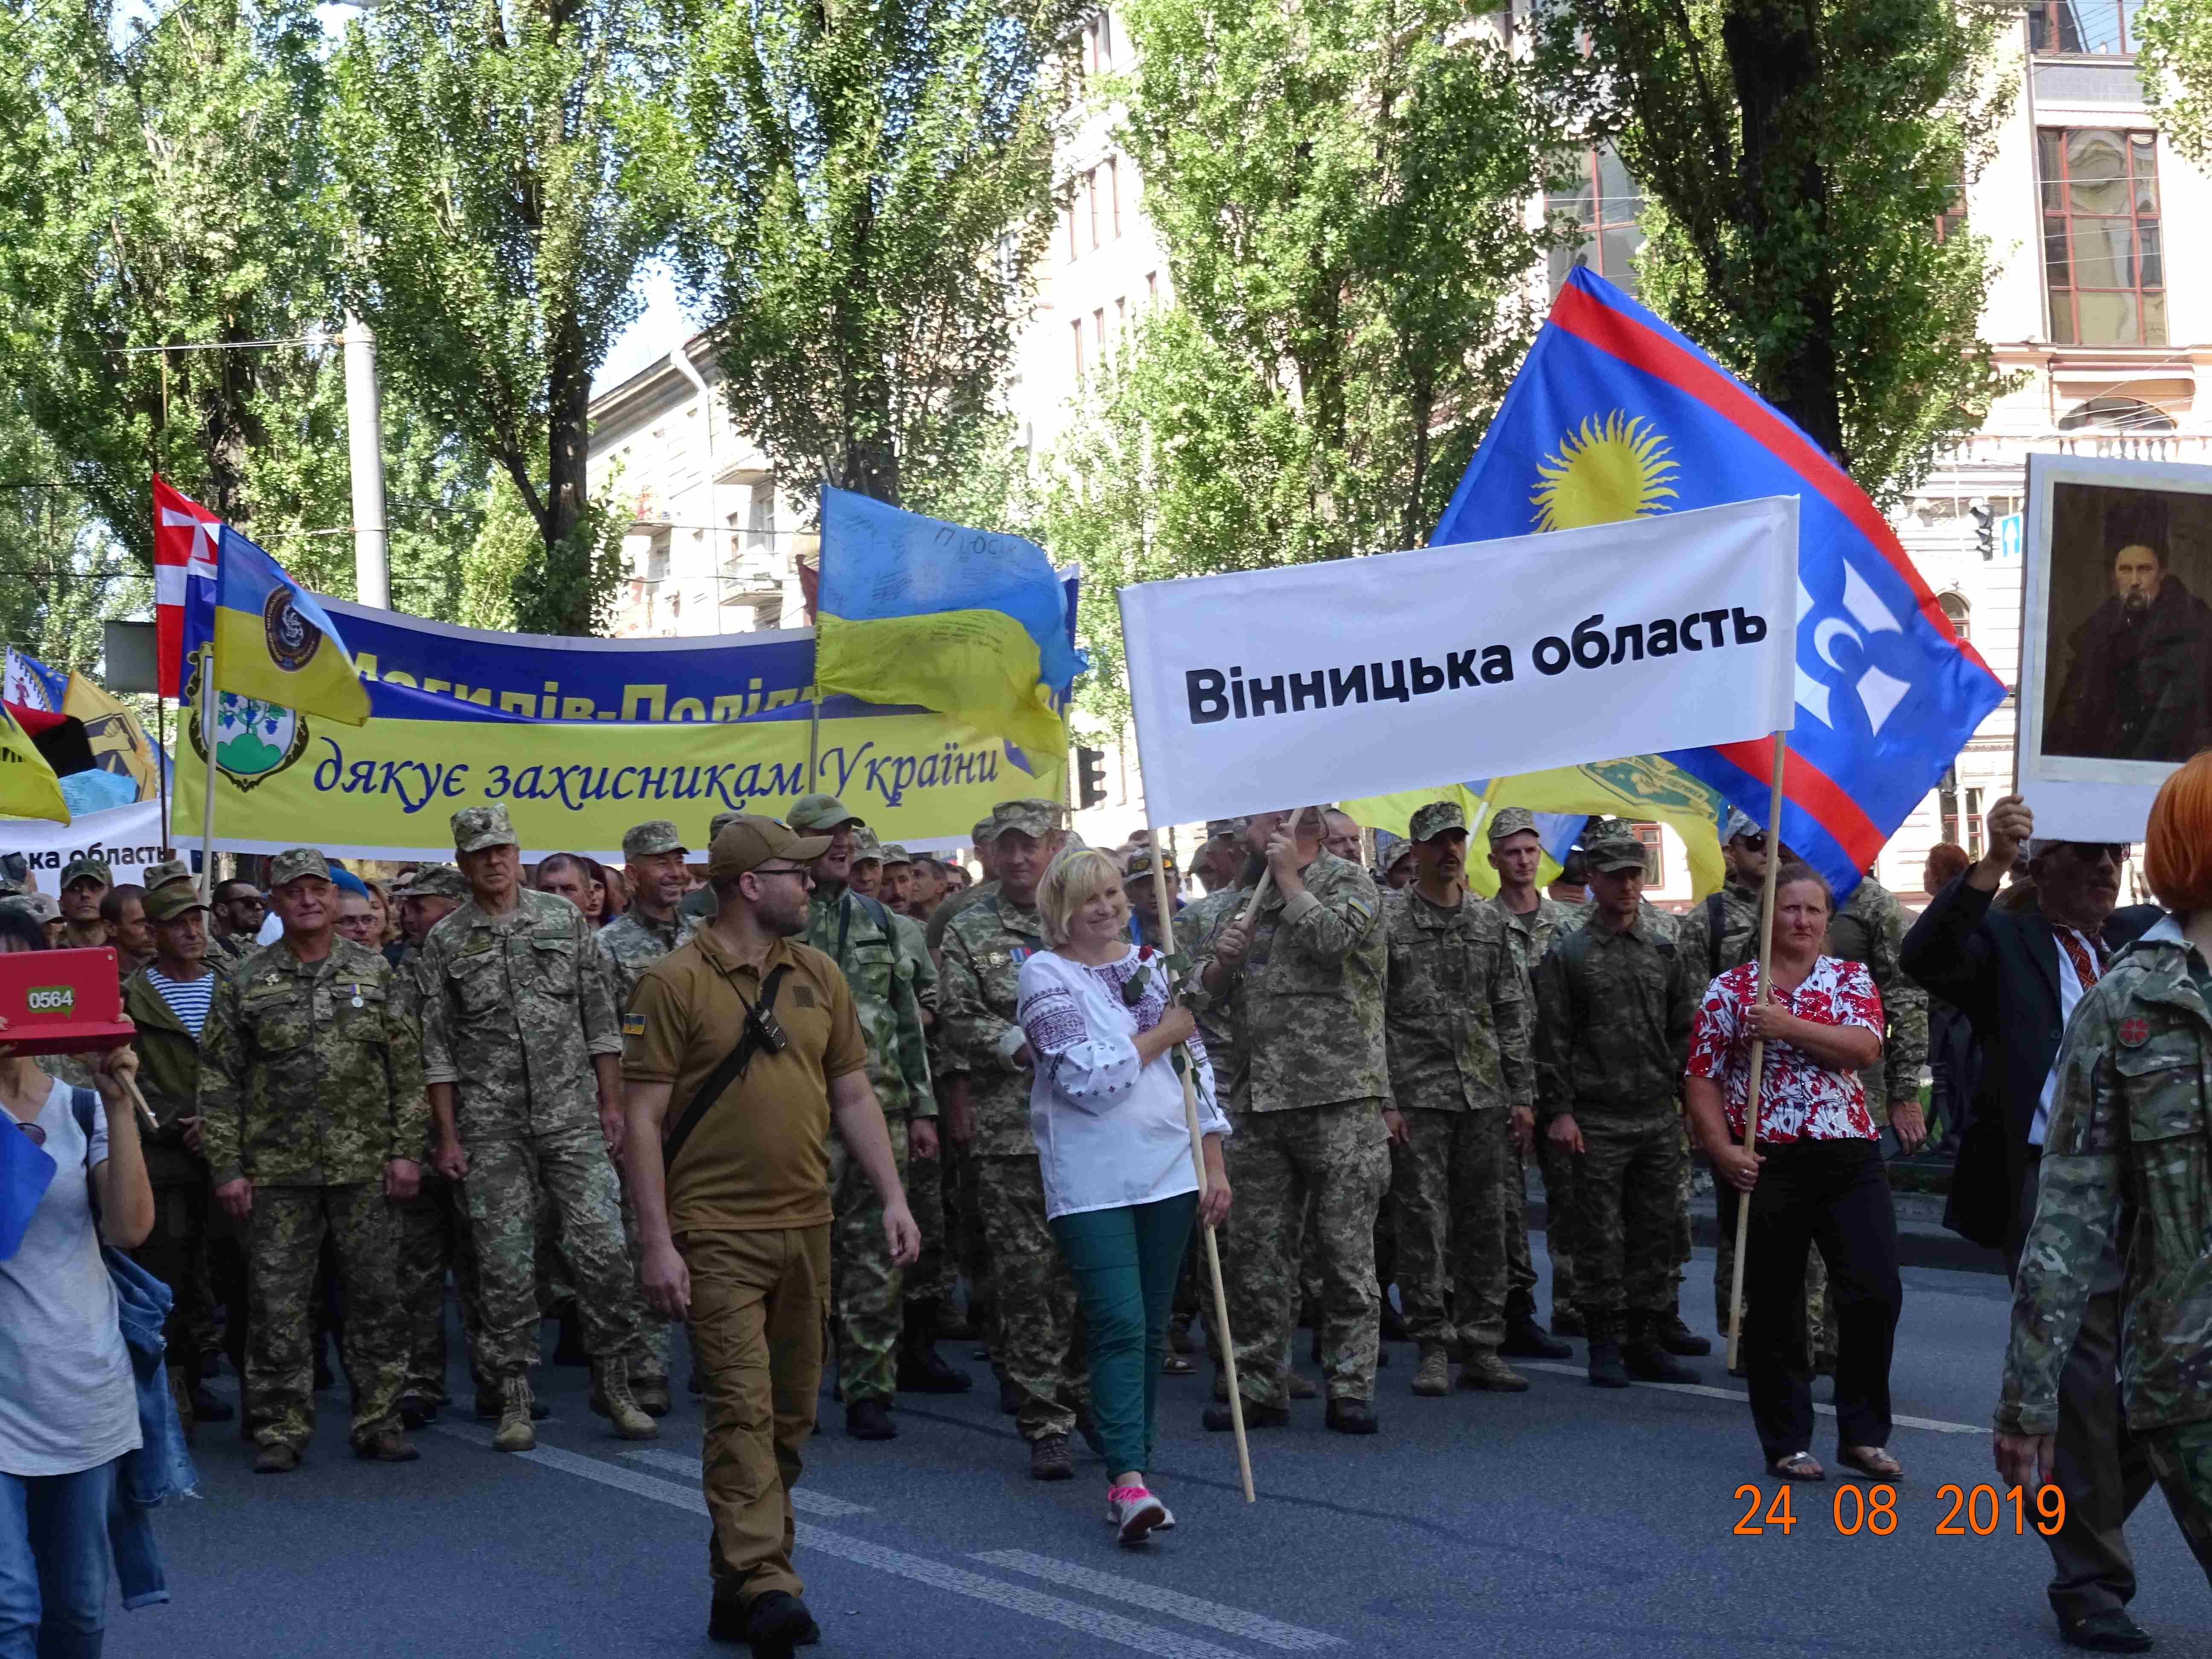 Defenders-of-Ukraine-Parad-24.Aug.19 - DSC06133.jpg